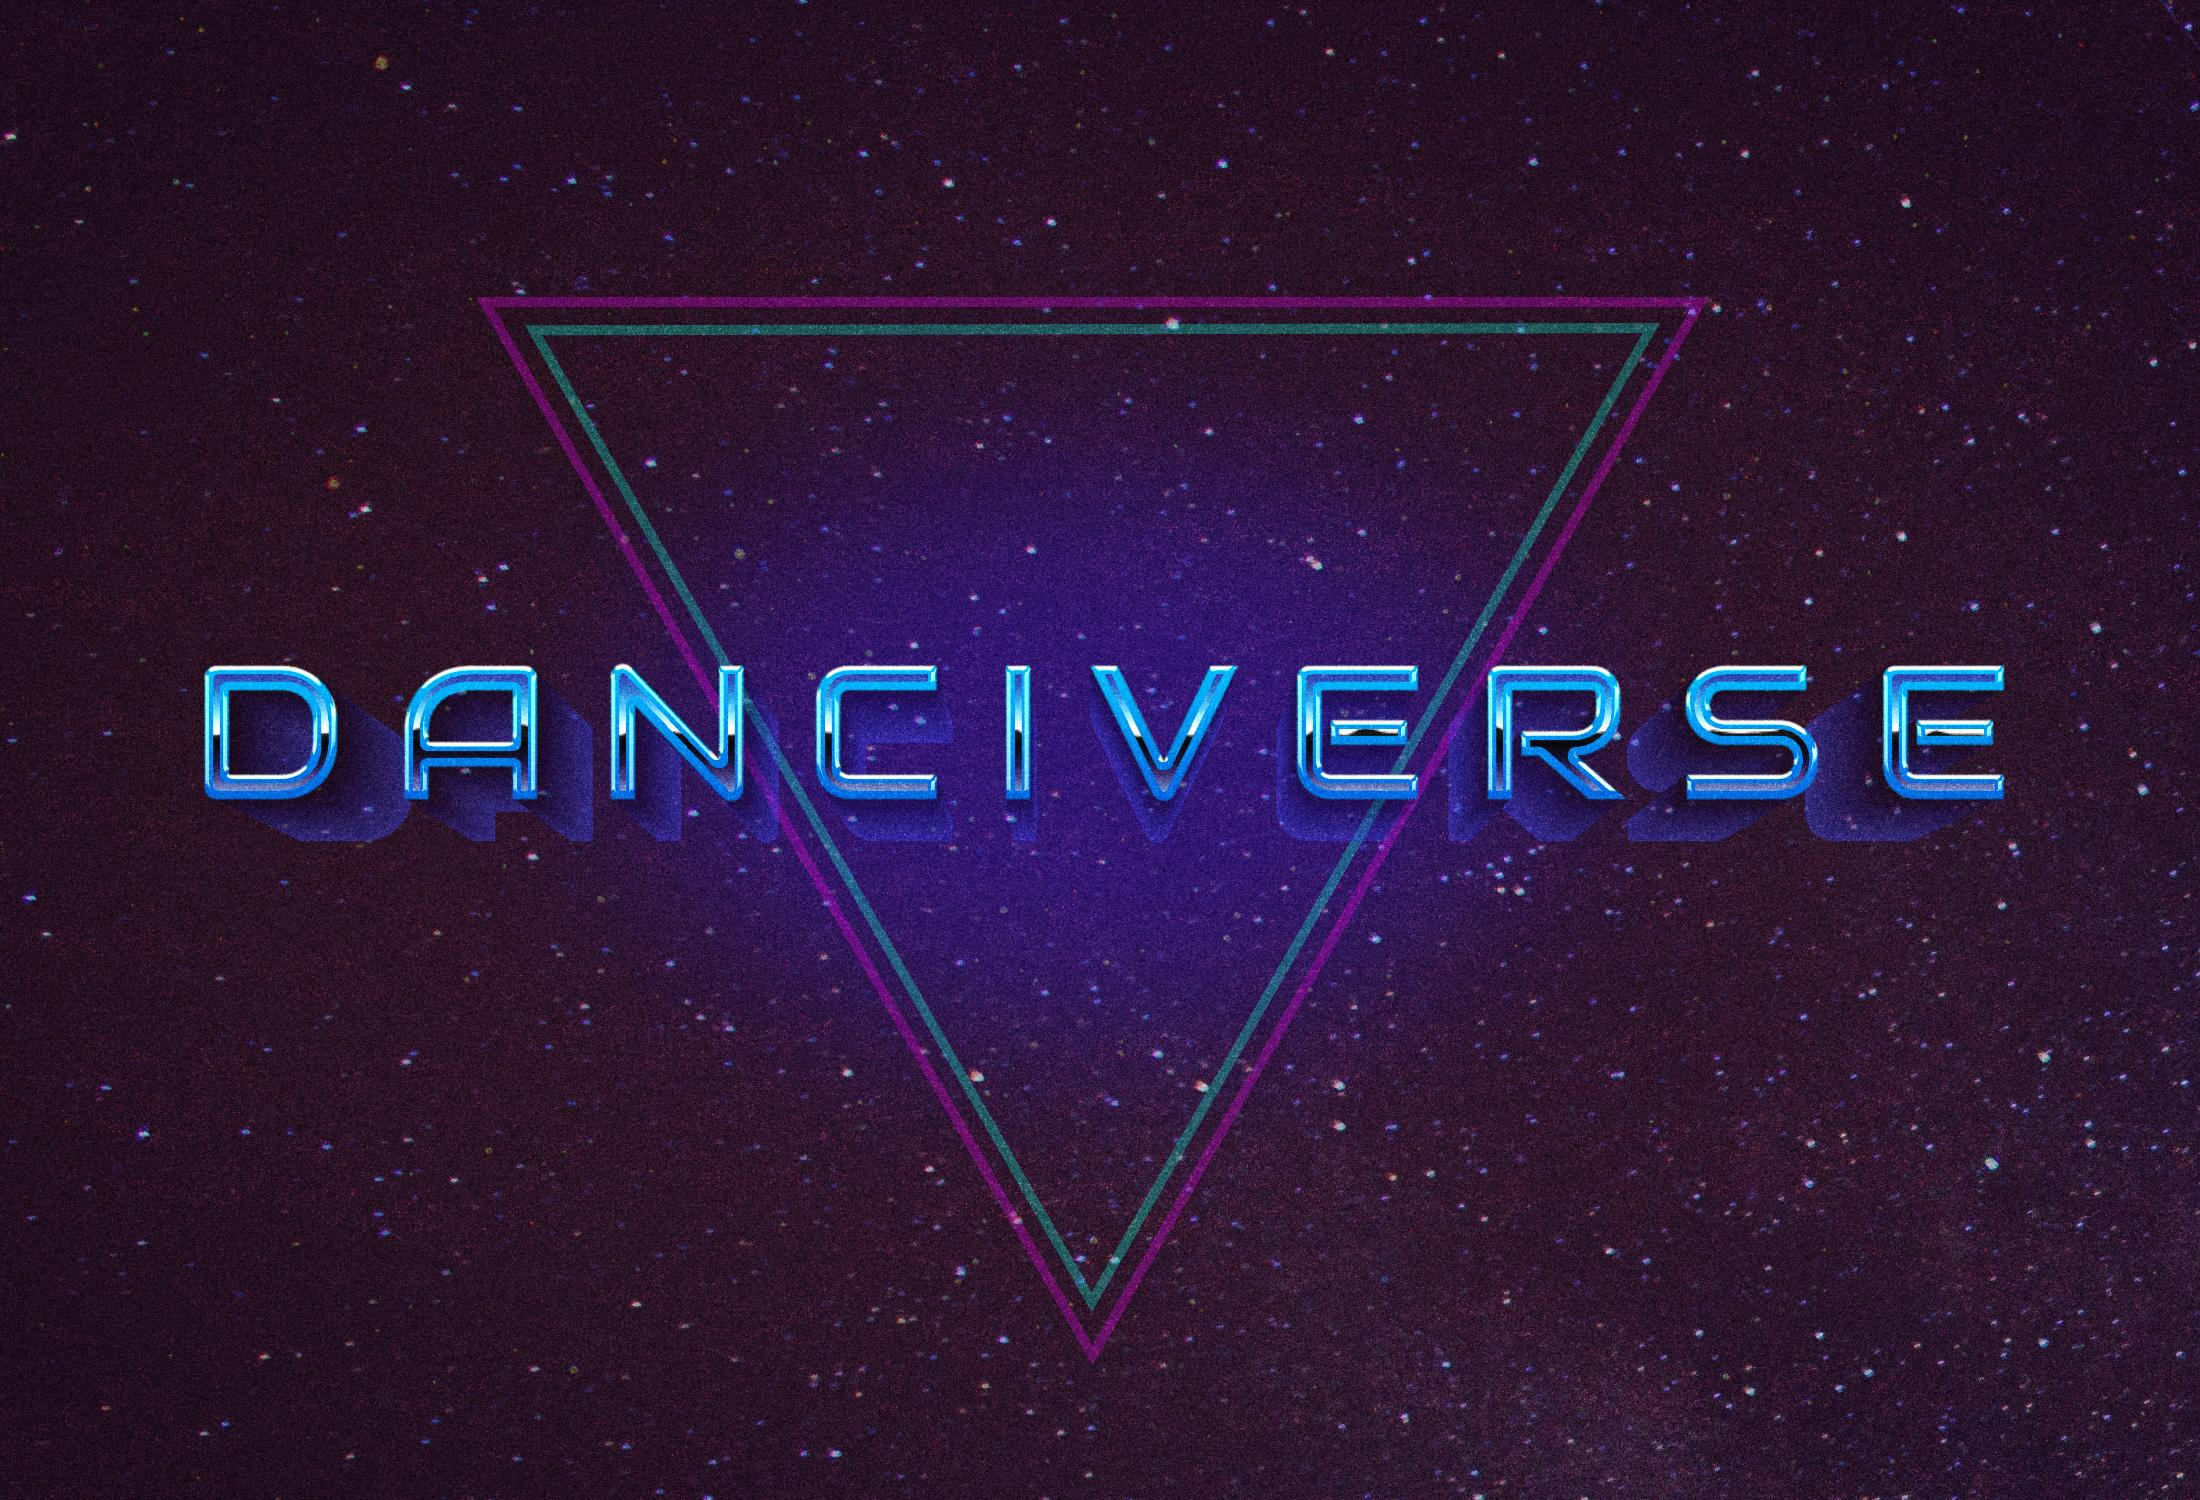 Logo design for Danciverse game